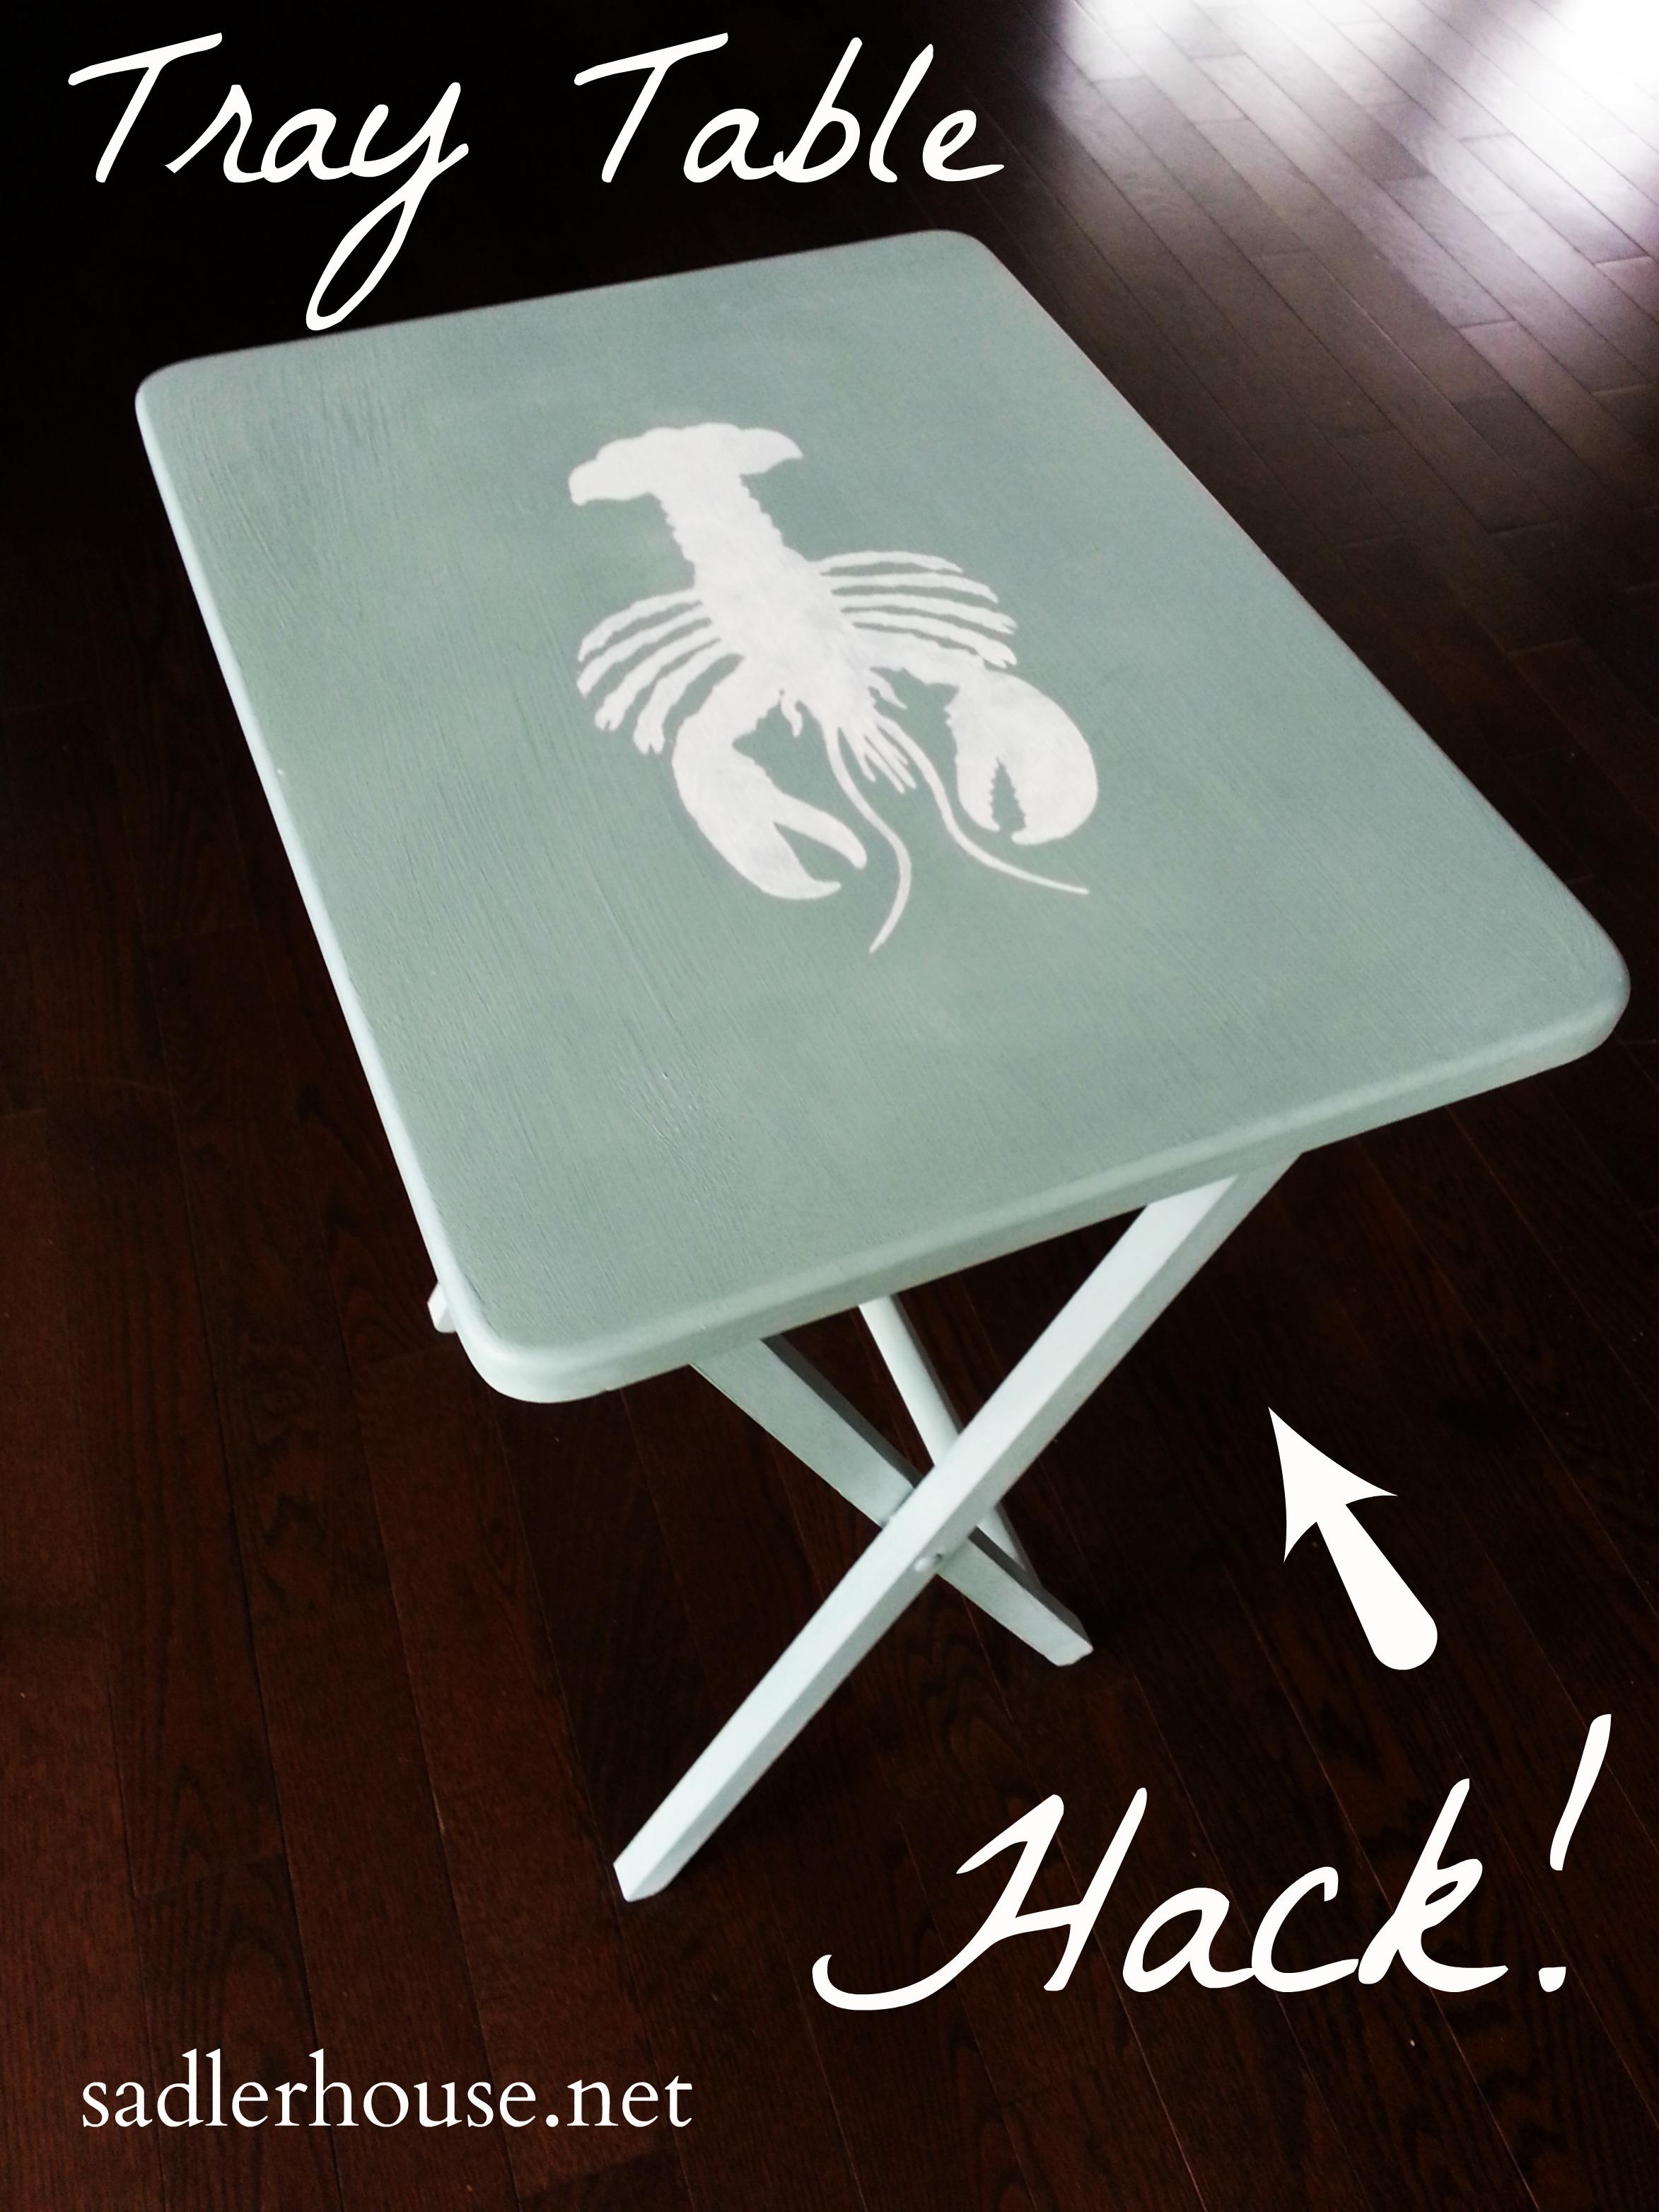 tray table hack